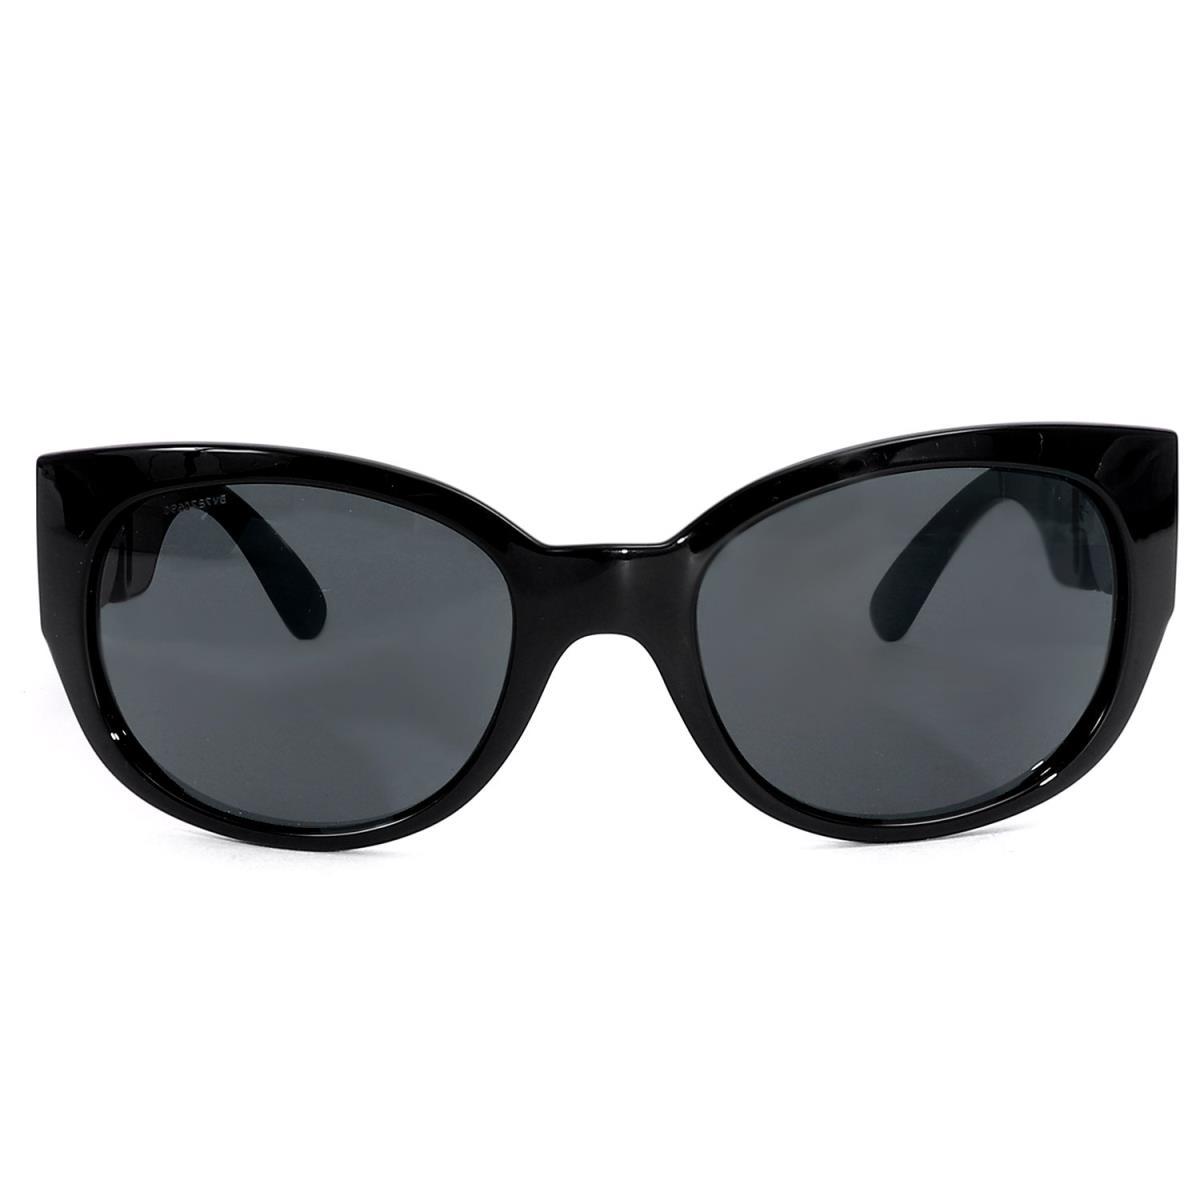 VERSACE (ヴェルサーチ) 2016年製 メデューサプレート付きスモークレンズサングラス(4265) ブラック 【メンズ】【美品】【K2162】【中古】【あす楽☆対応可】